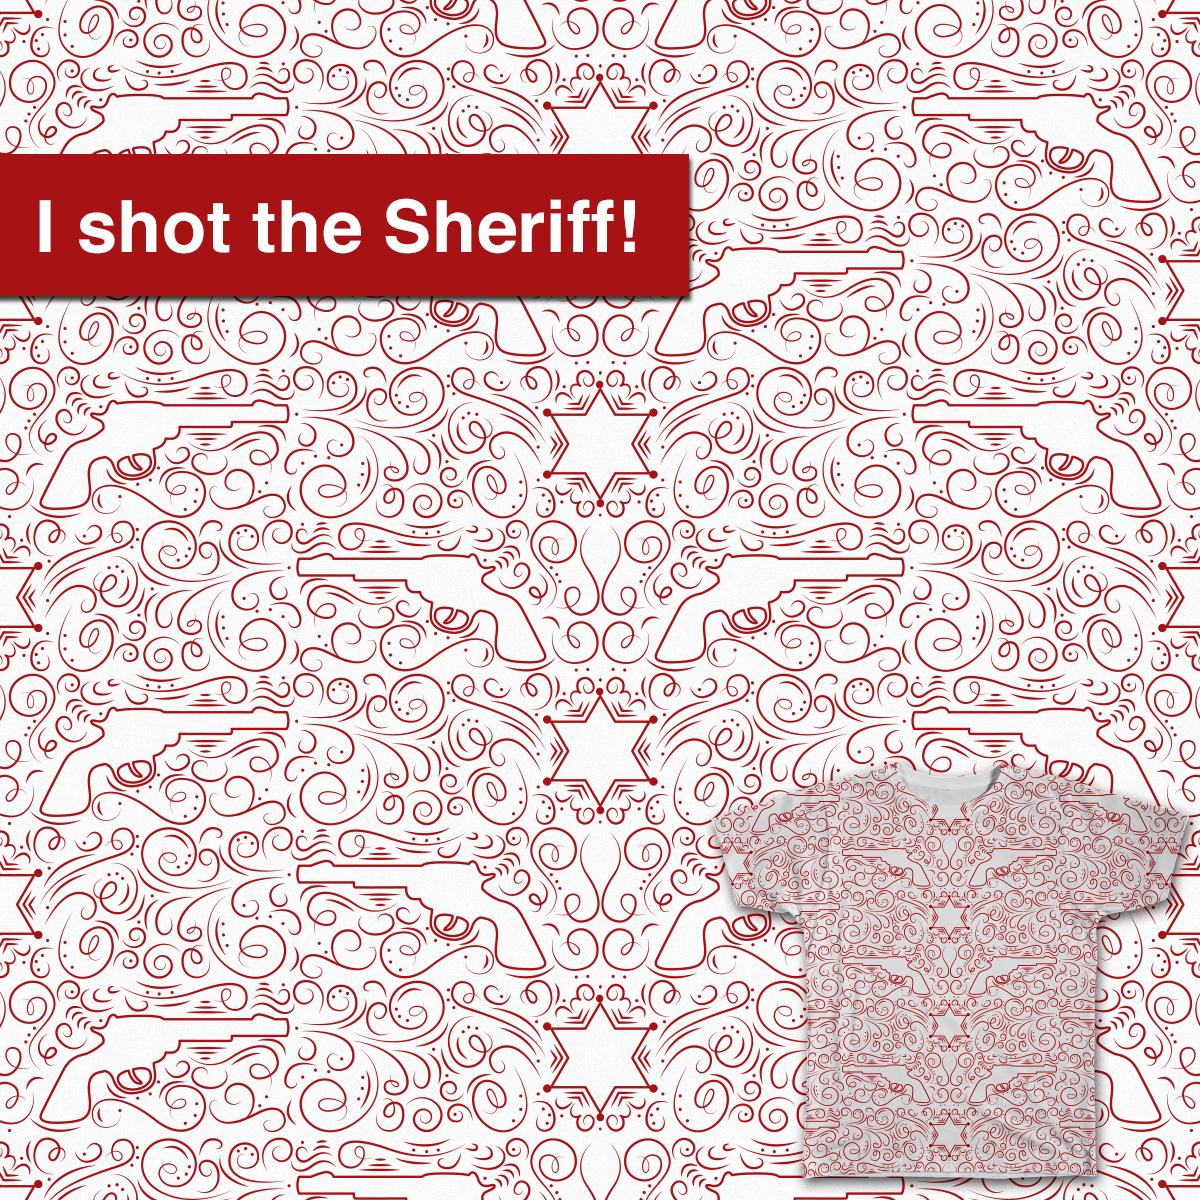 I shot the Sheriff! by velikaya on Threadless